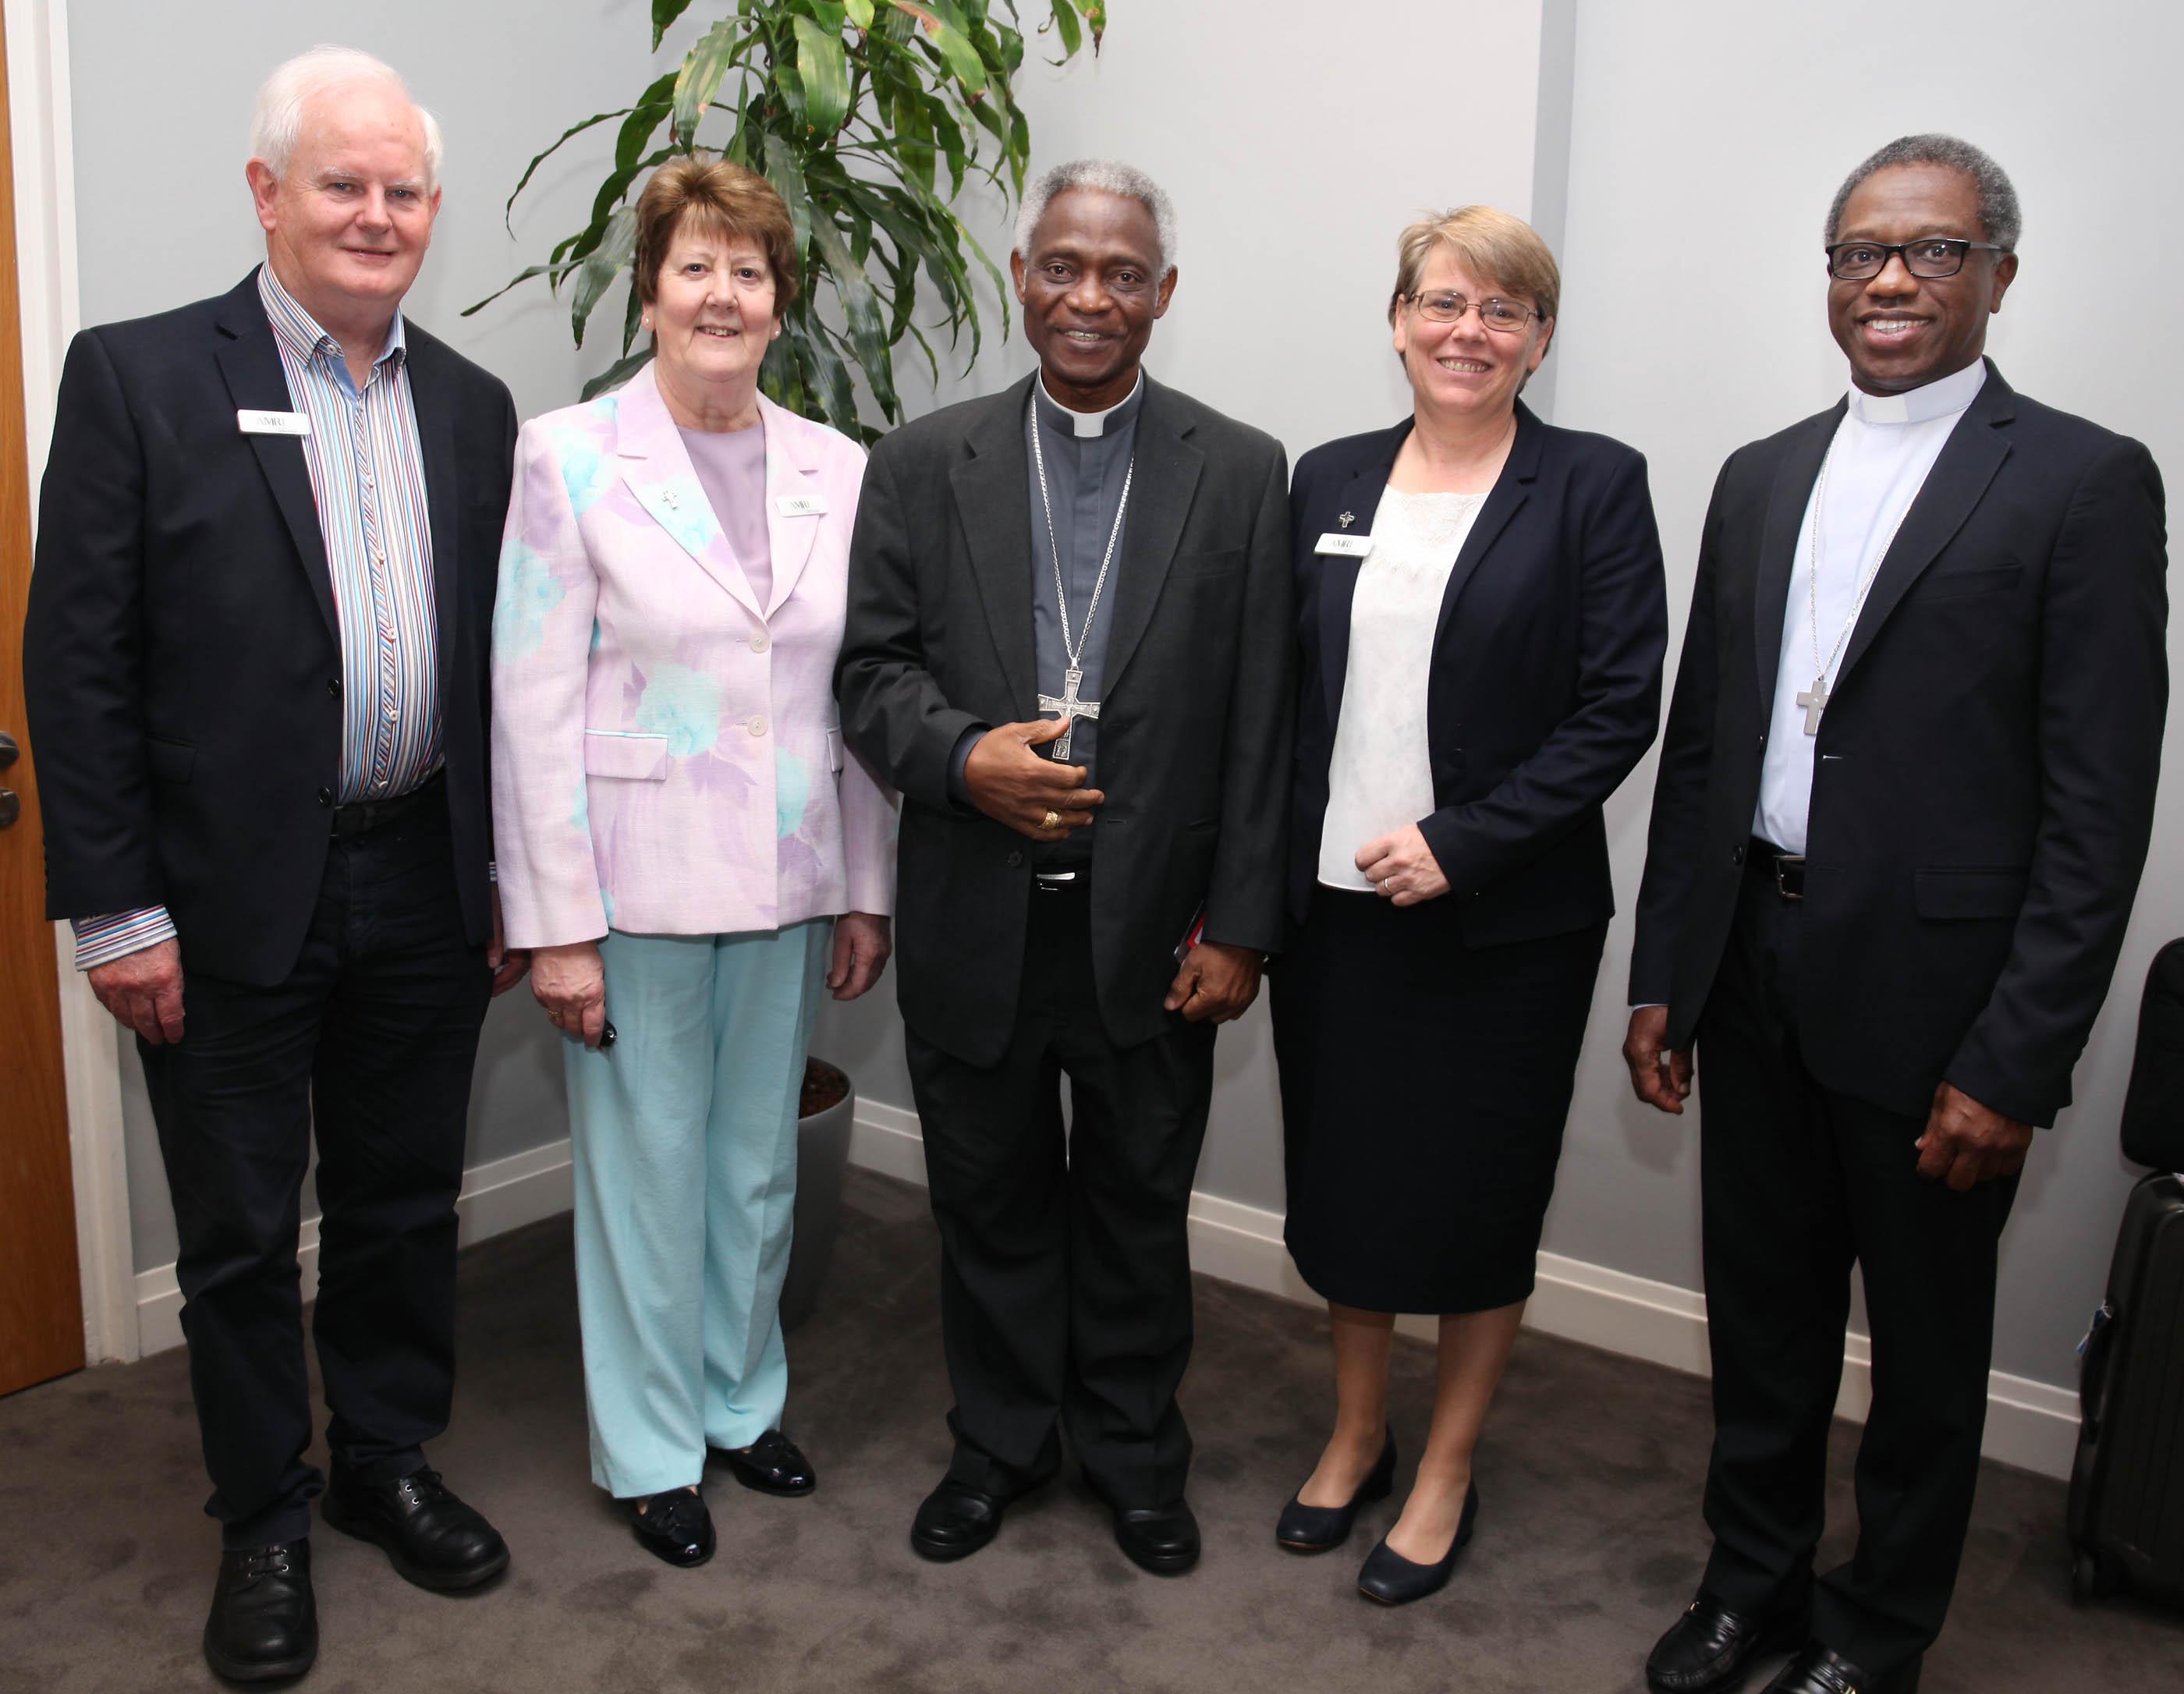 Fr Tom O'Connor, Sr Liz Murphy, Cardinal